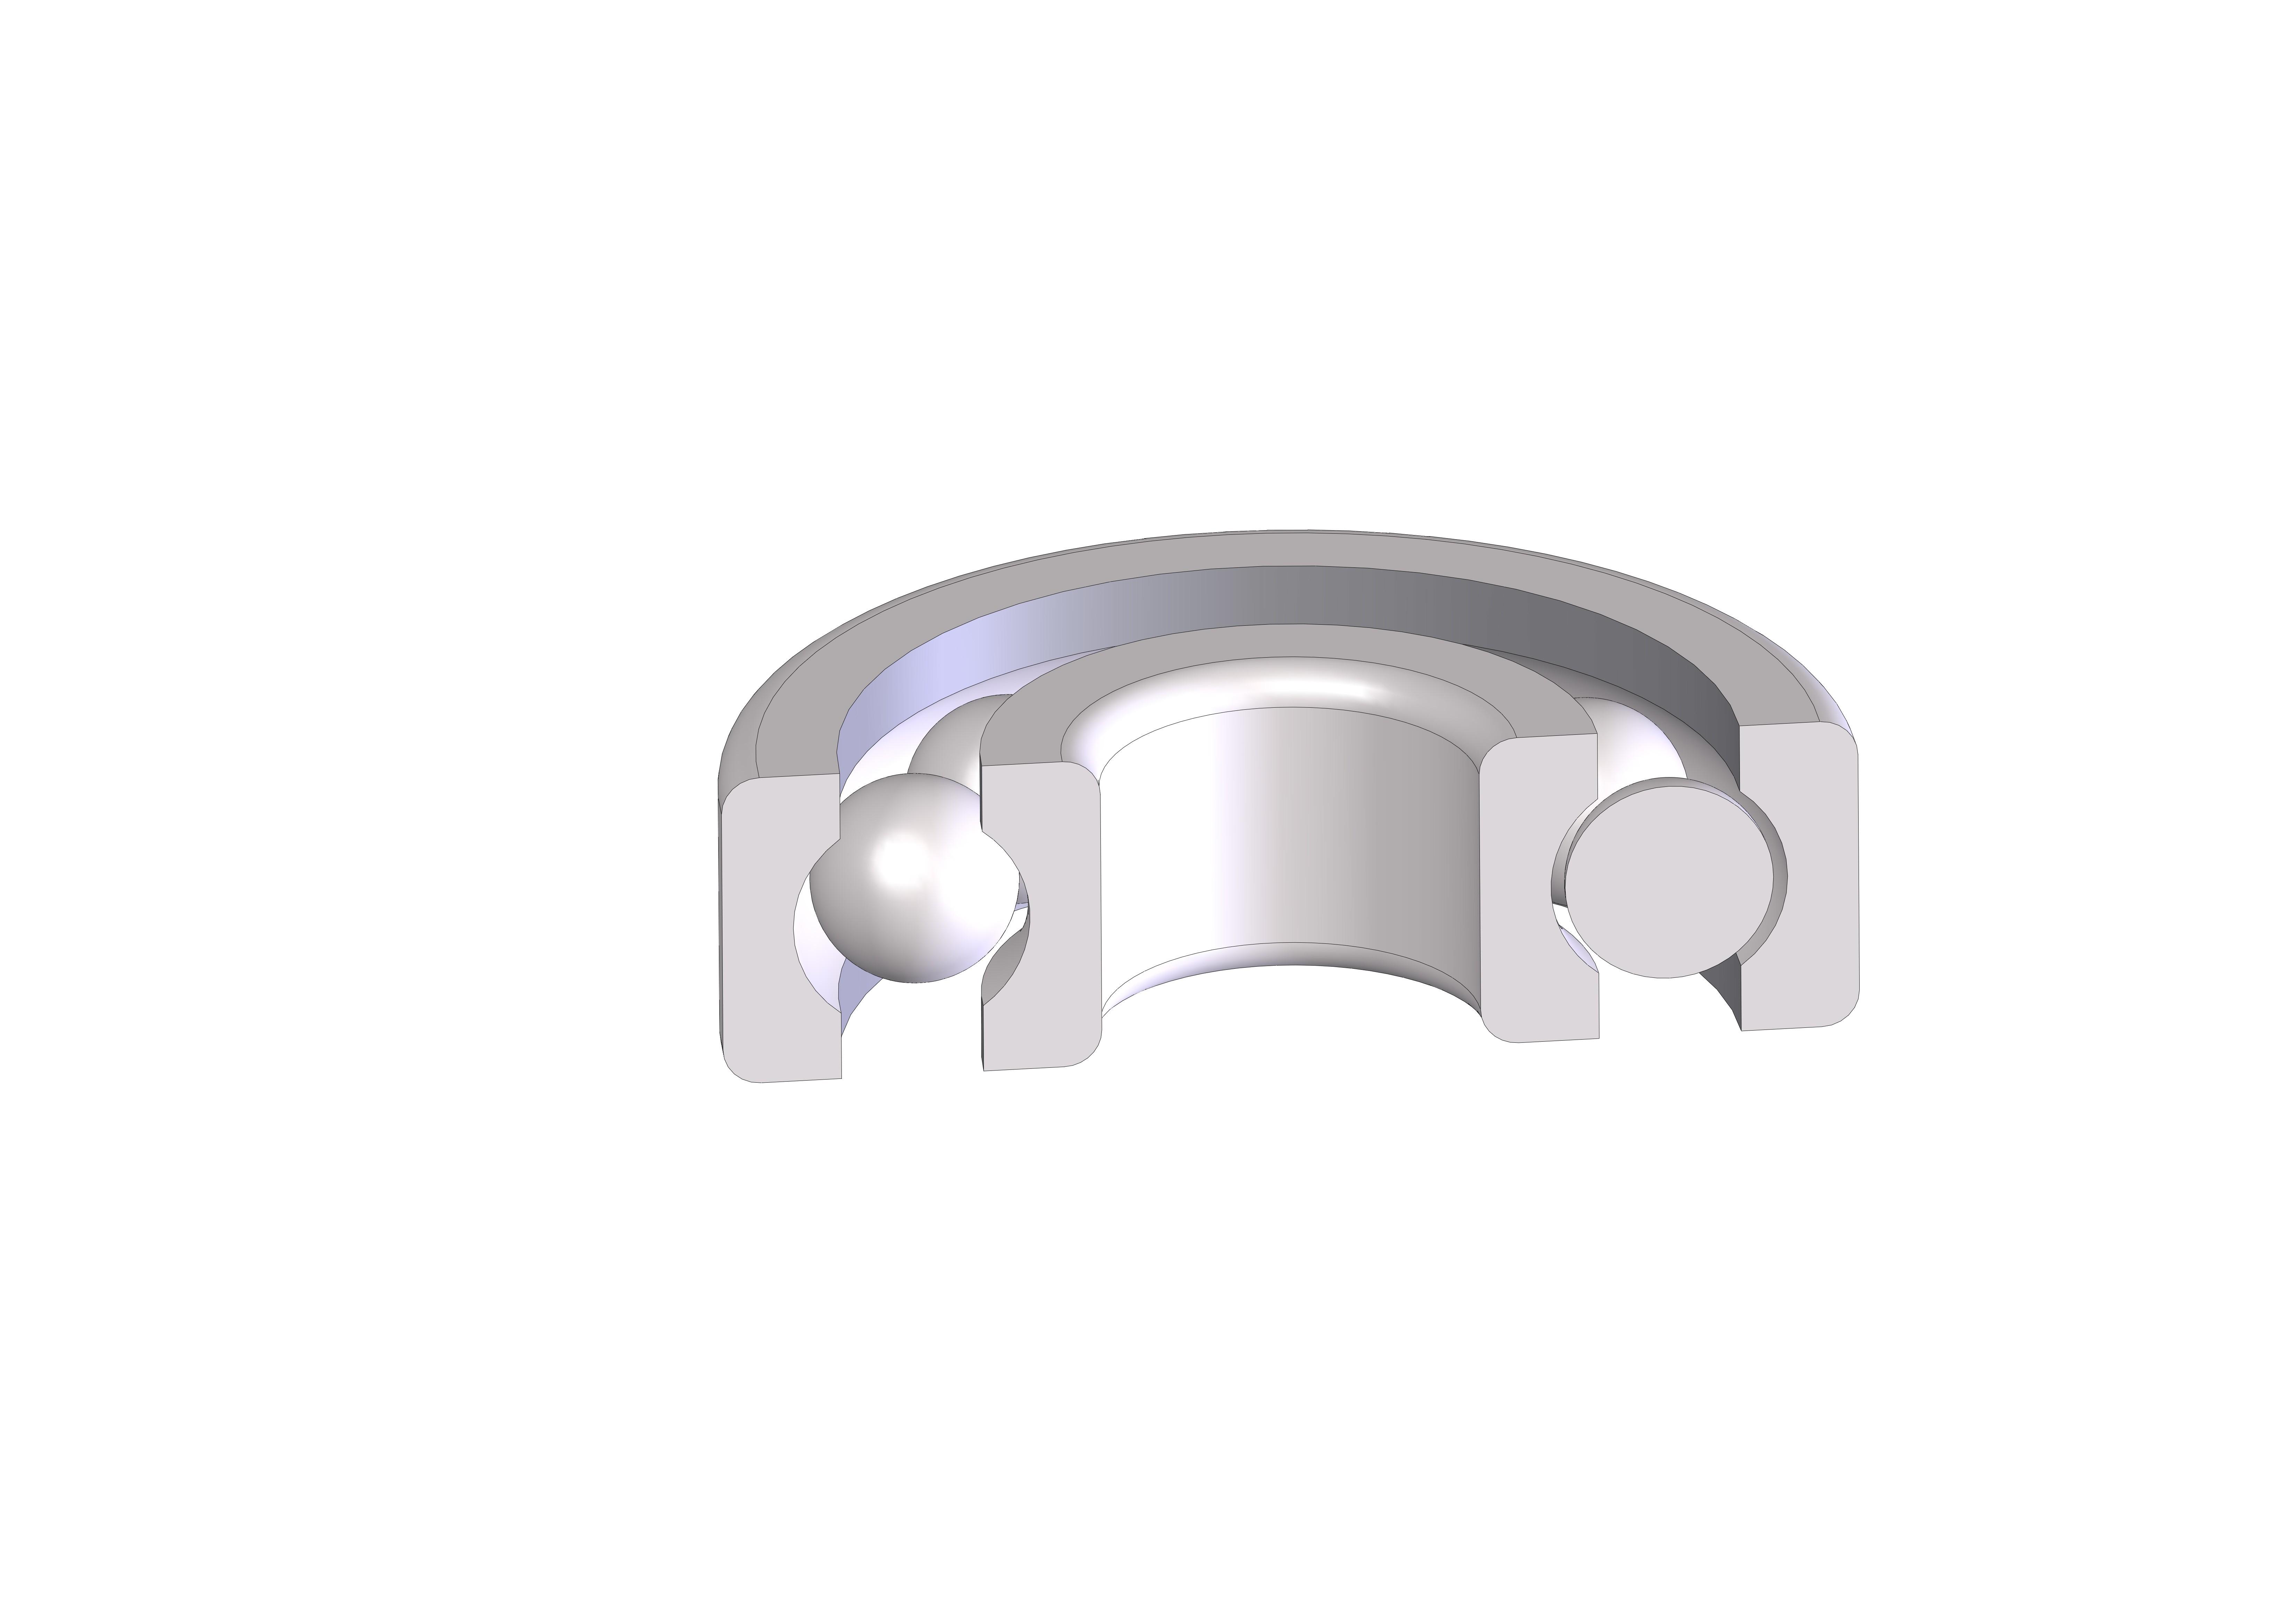 ROULEMENT  d08-D24-h07 mm B.JPG Download STL file ROLLING 08-24-07 Bearing 628 • 3D printer design, Laurence